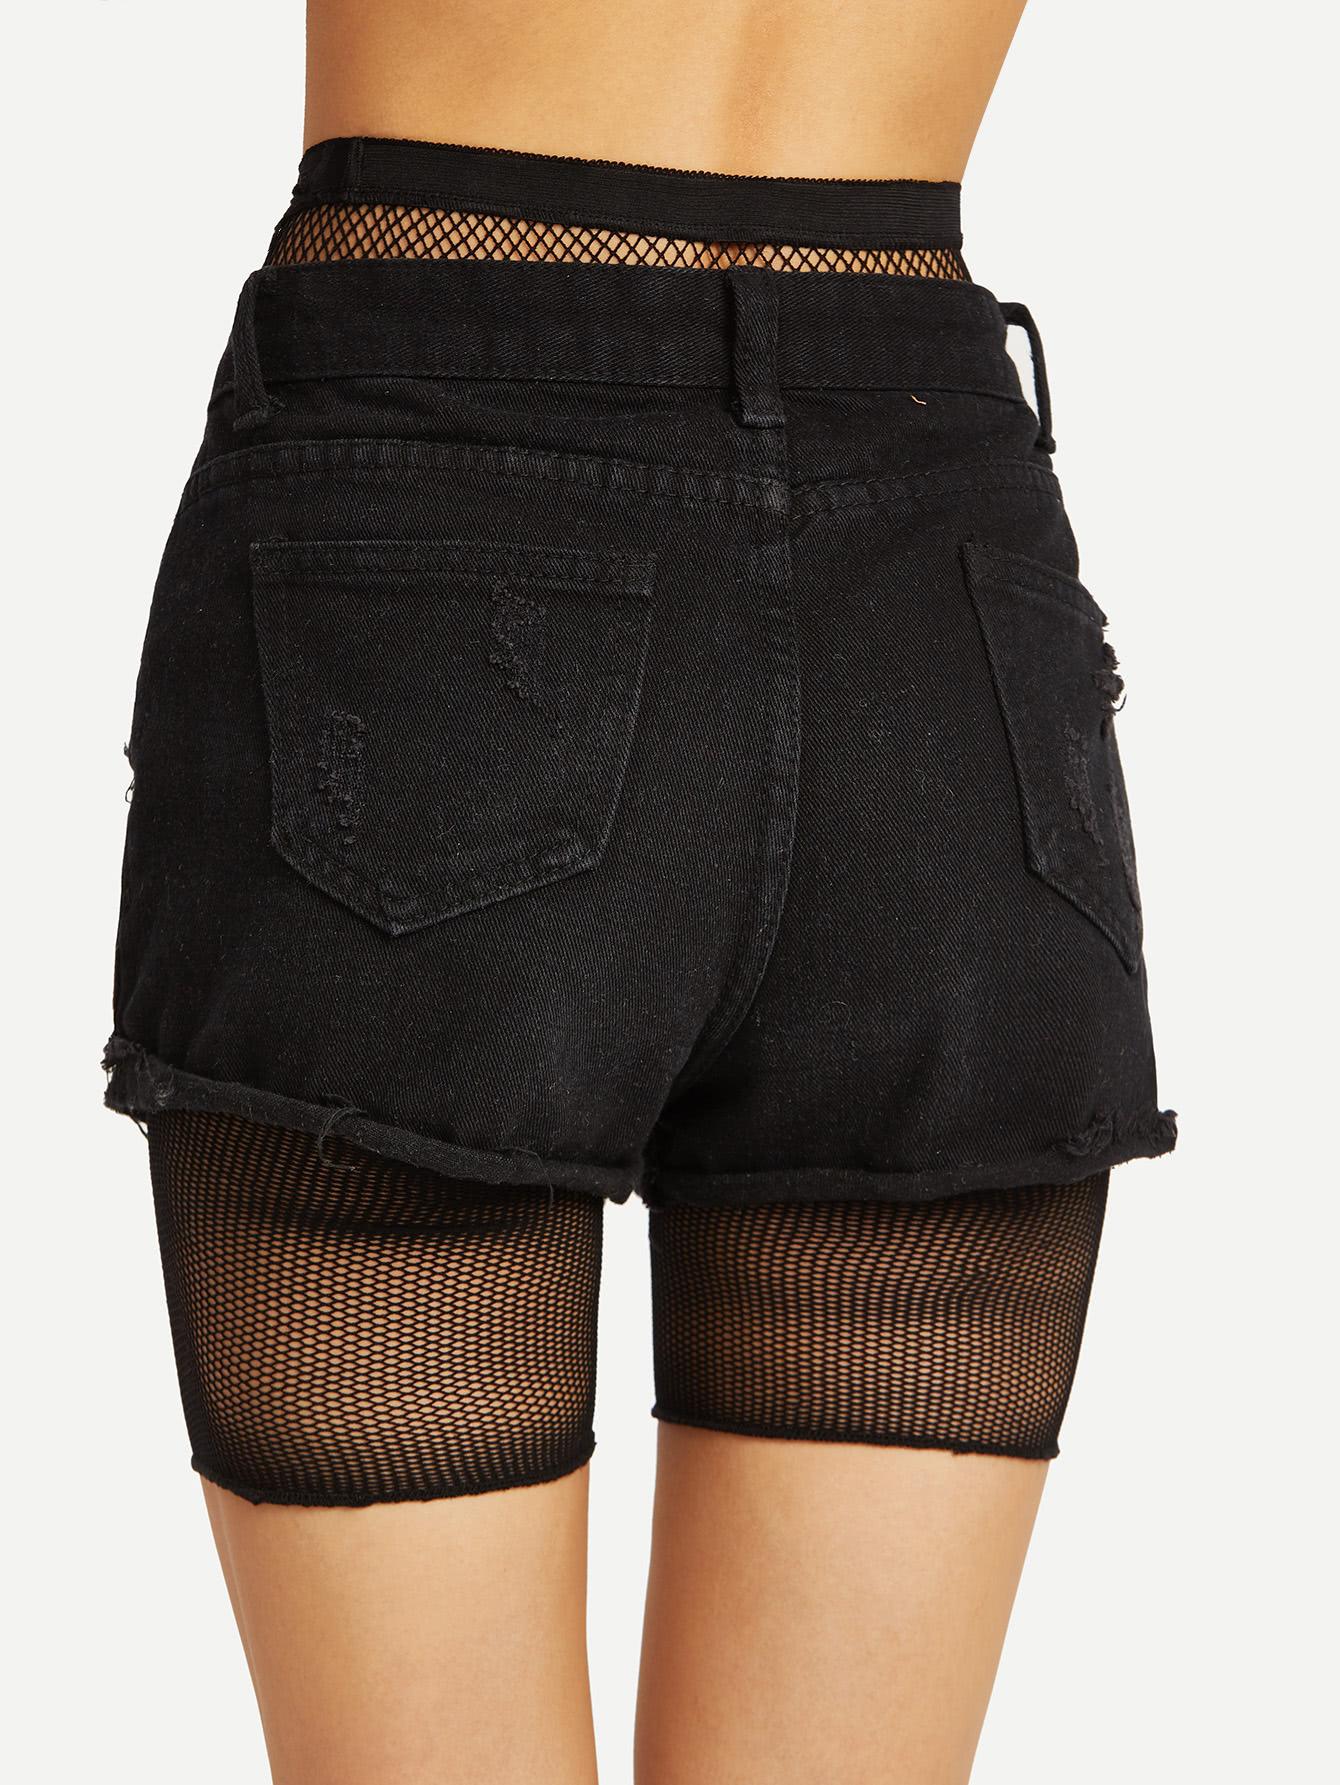 Fishnet Legging Shorts